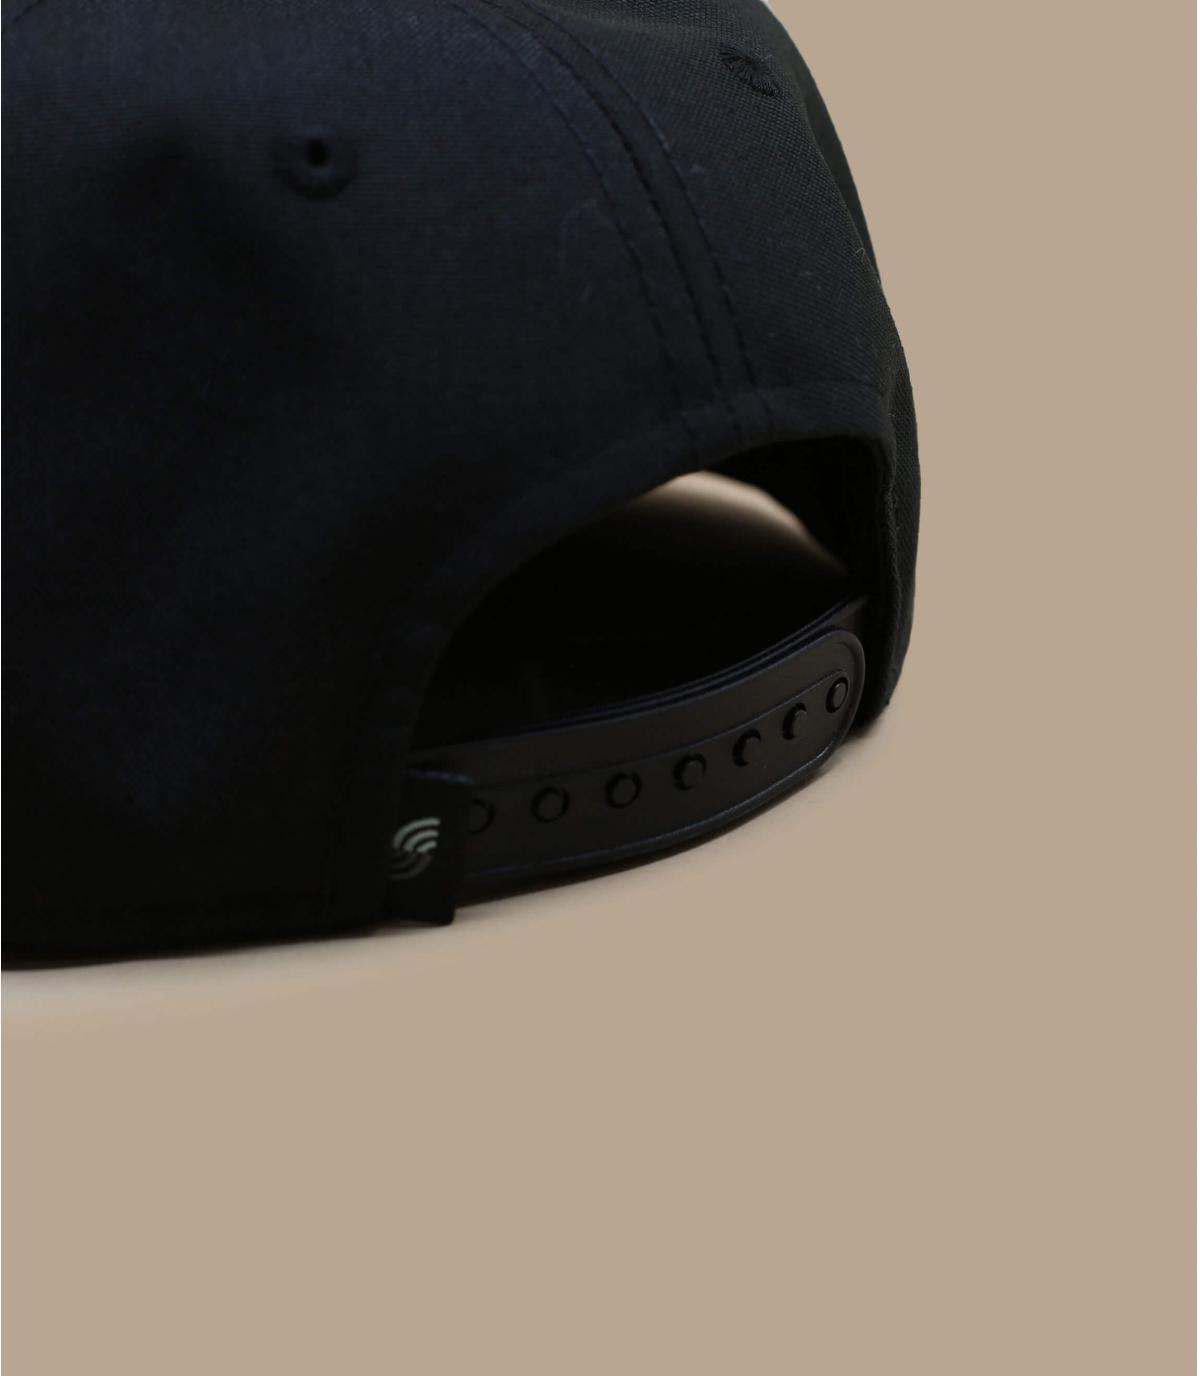 Detalles Snapback Recycled black imagen 4